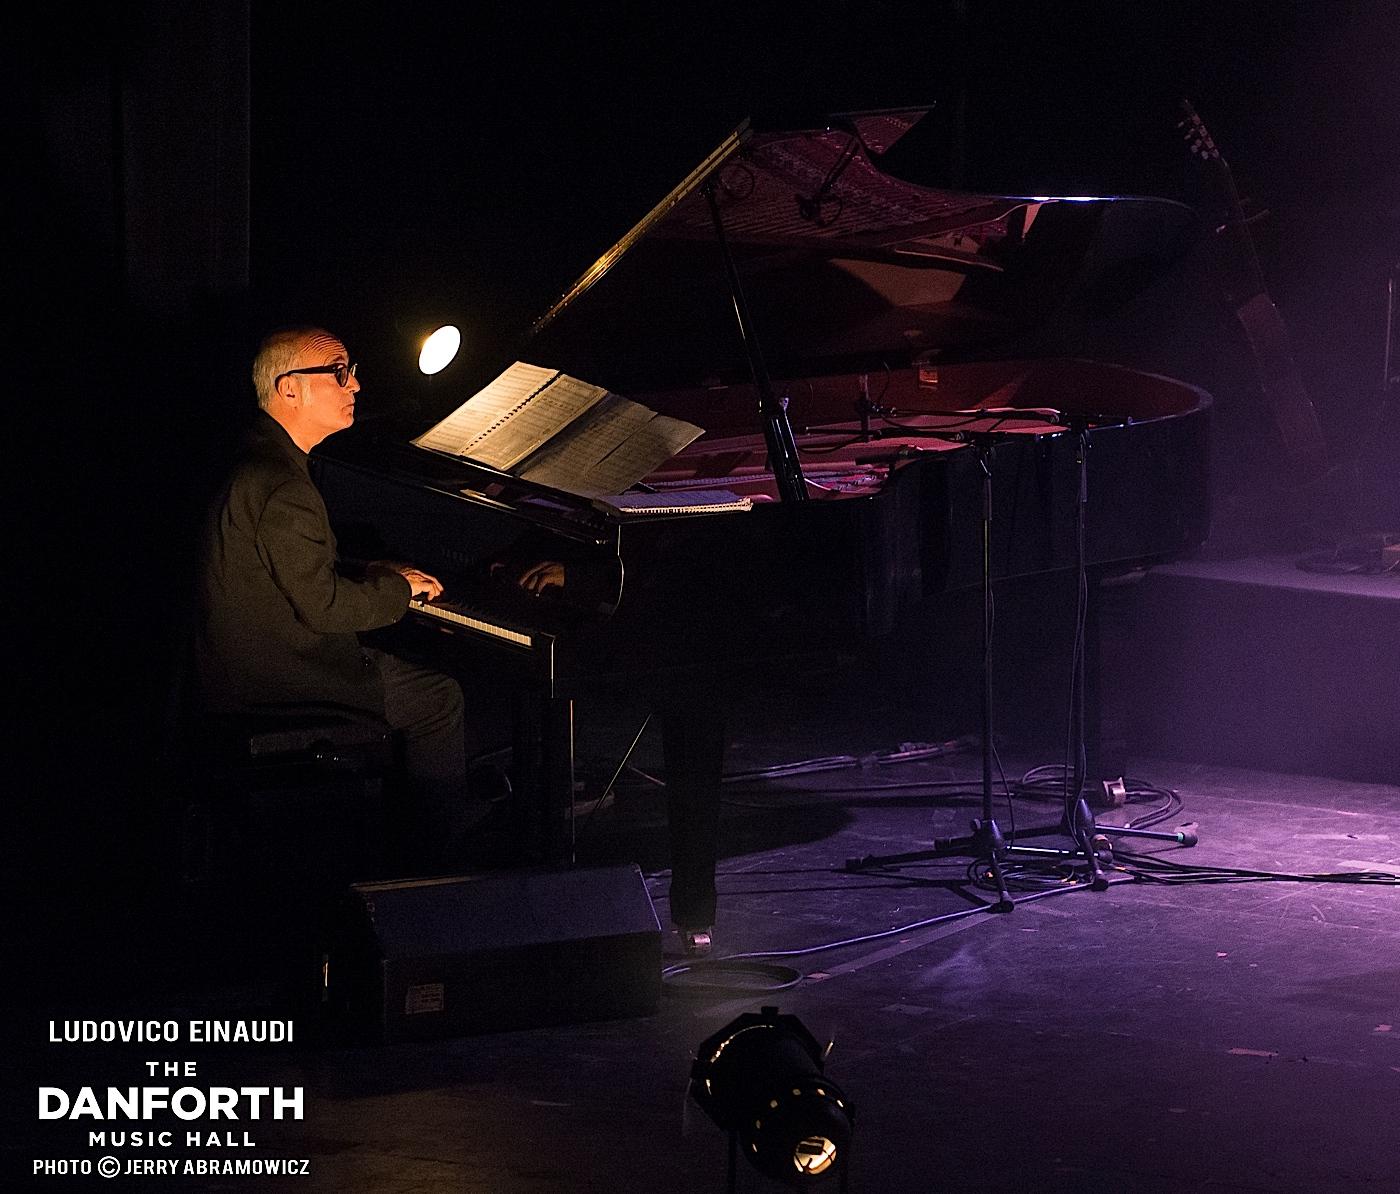 20130517 Ludovico Einaudi performs at The Danforth Music Hall Toronto 0177